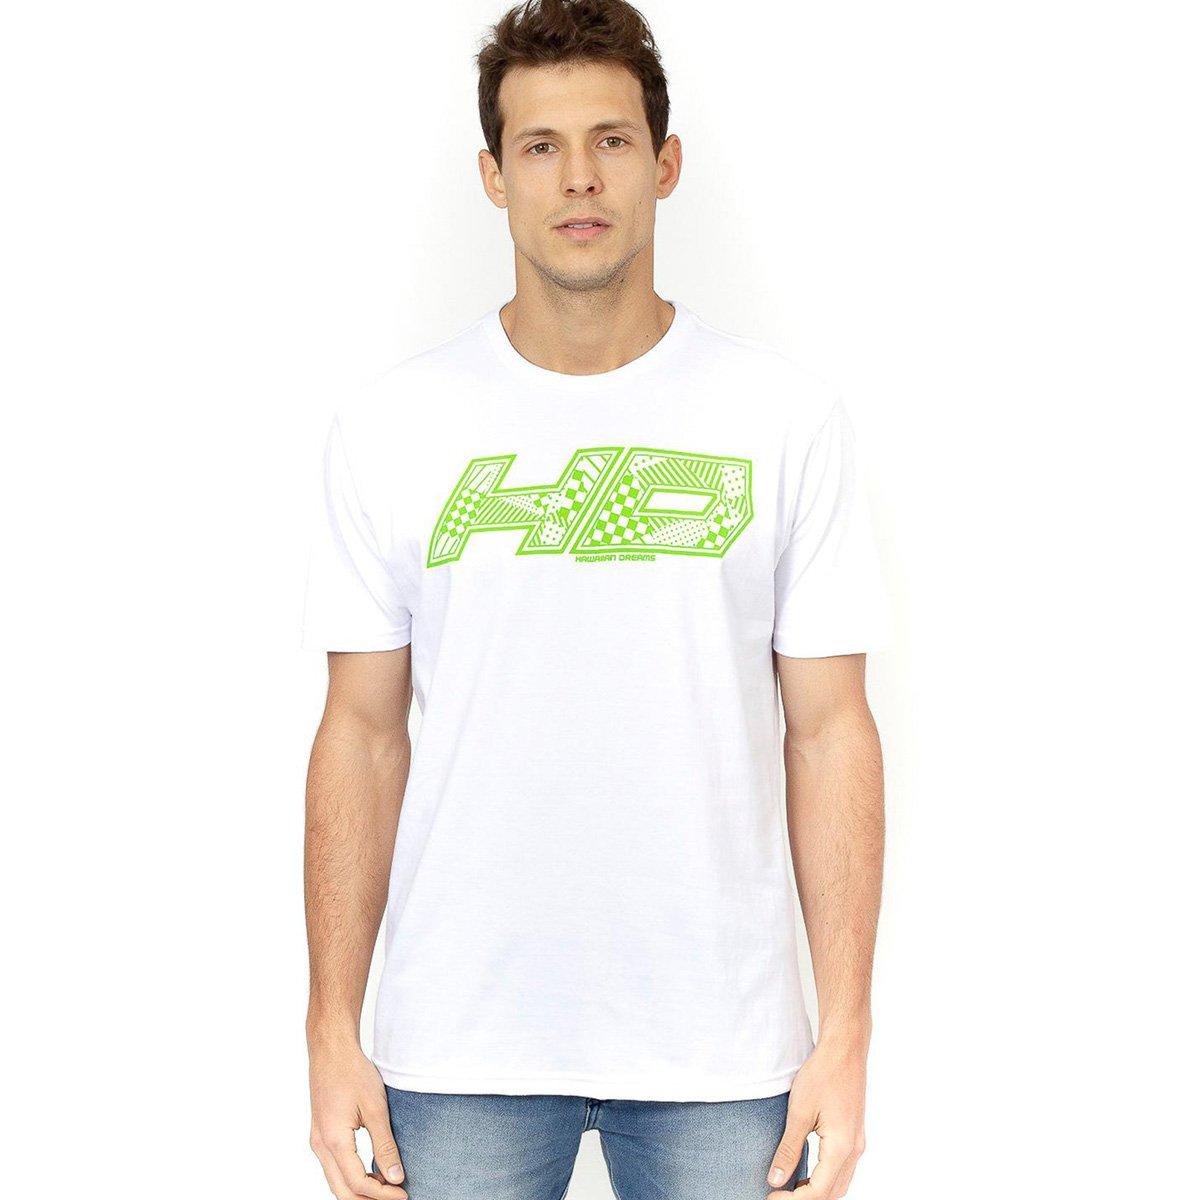 Camisa HD Logo Quadriculado Masculina